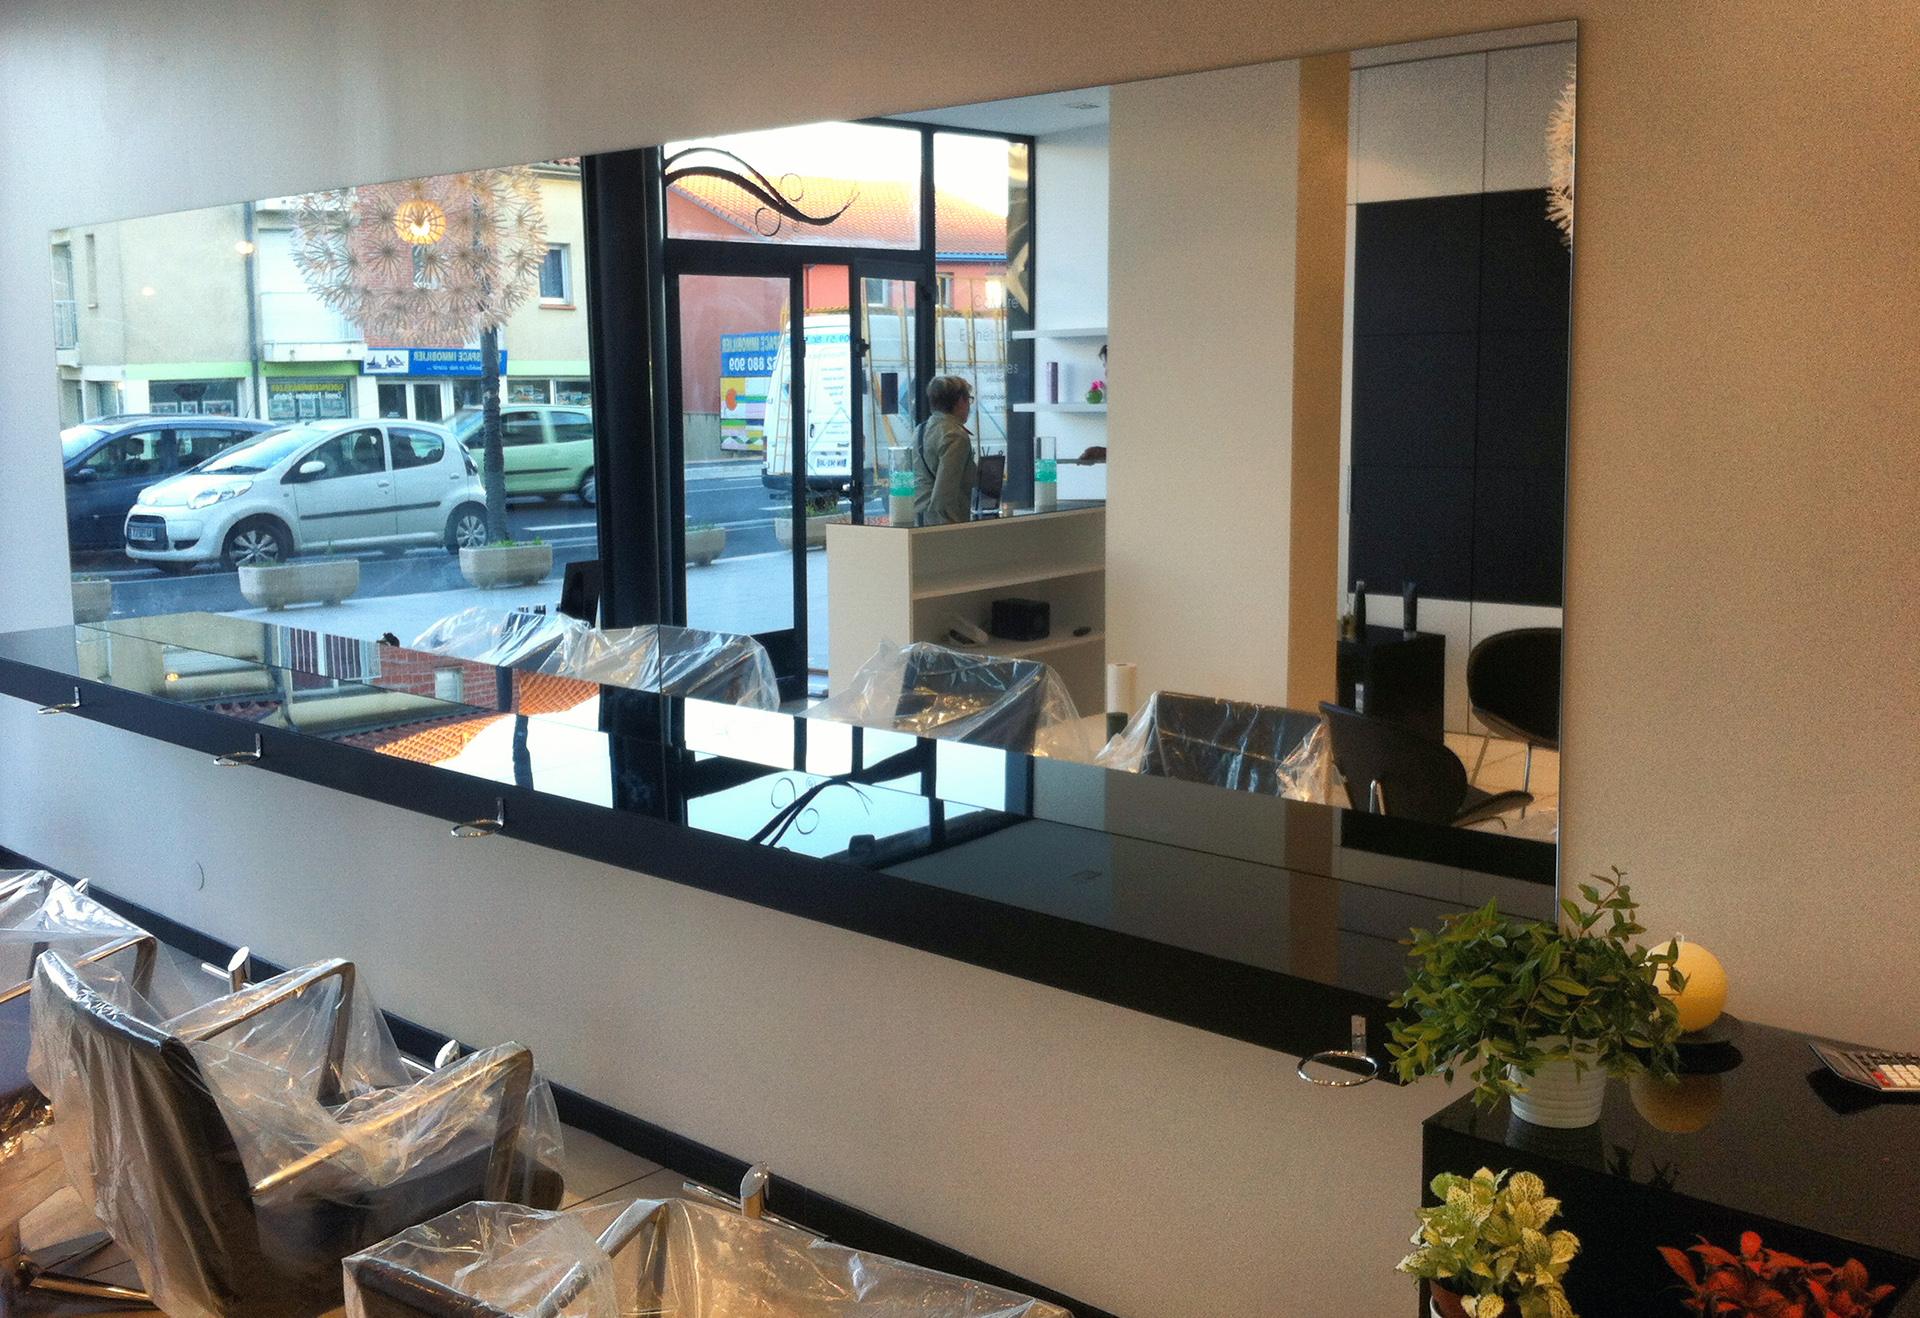 Miroir salon de coiffure abm miroiterie vitrerie for Miroir salon